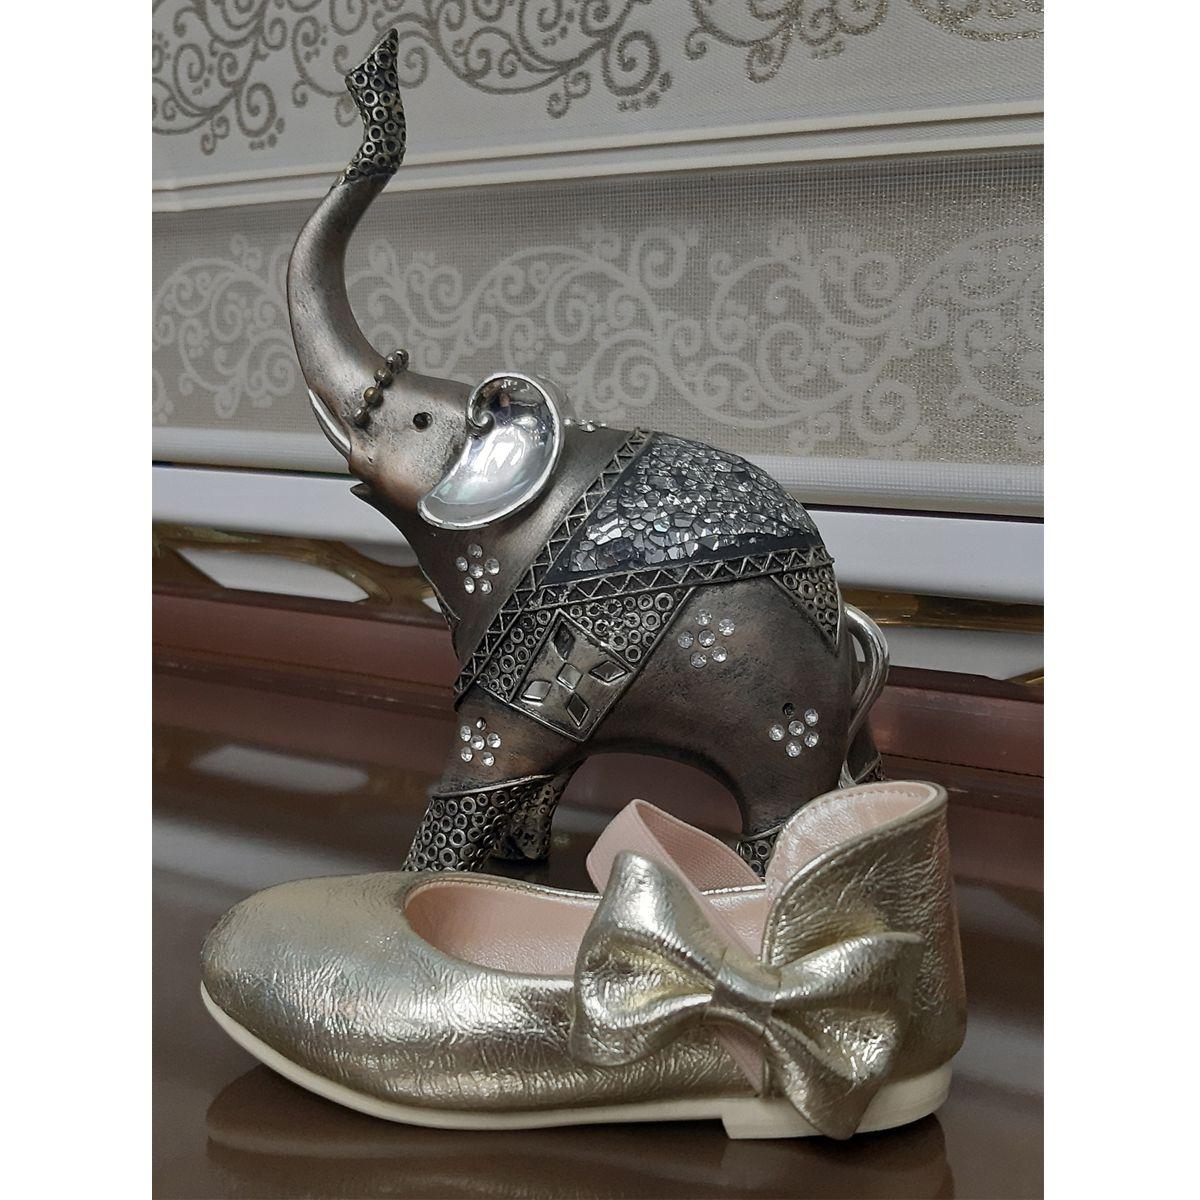 کفش دخترانه طرح پاپیون مدل 78041 -  - 5